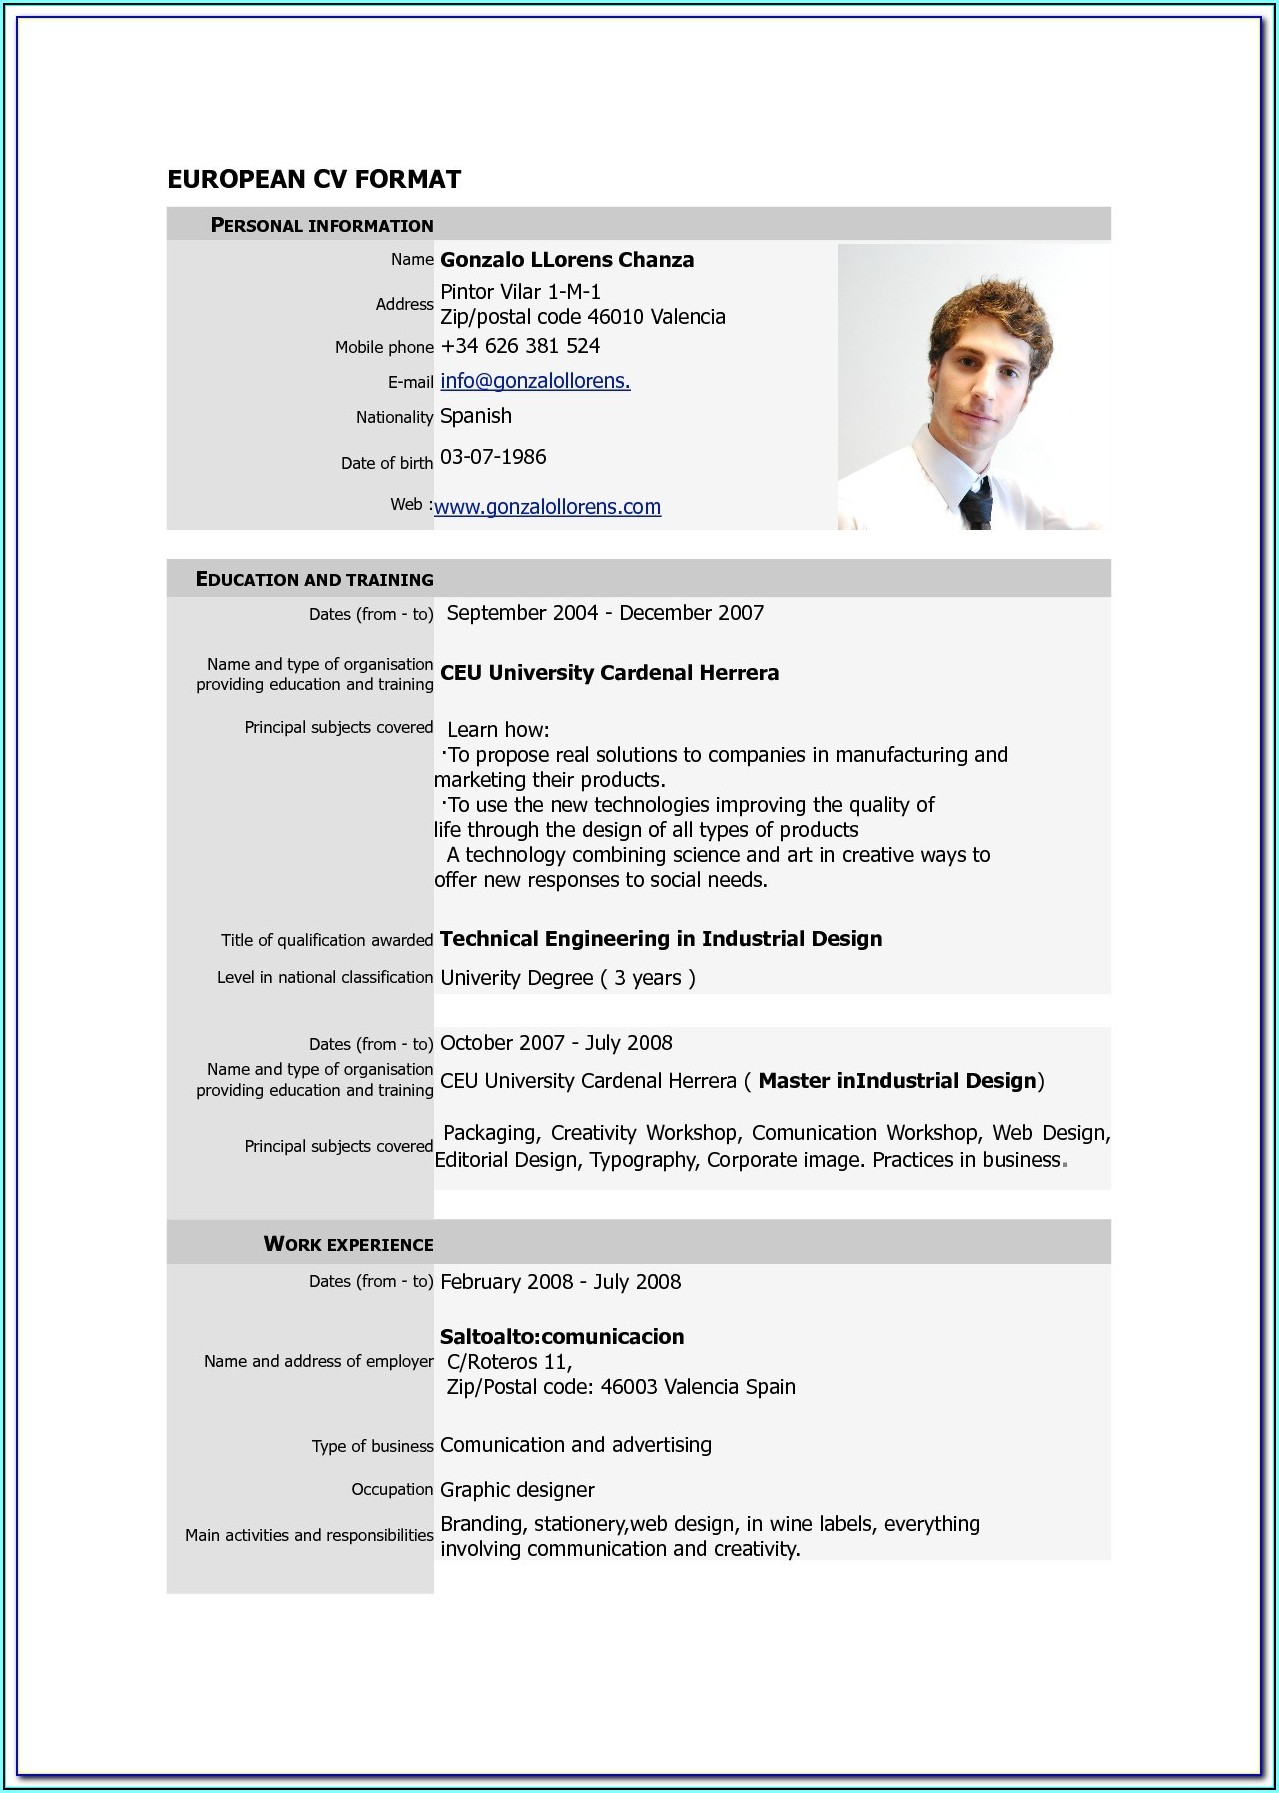 Resume Template Pdf Free Download